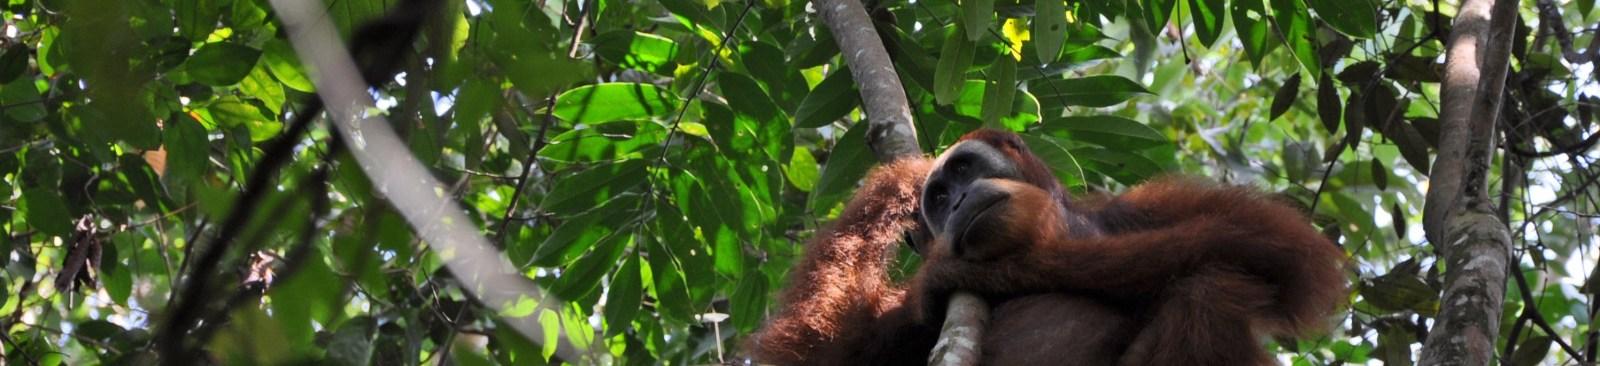 Sumatra e Bali 2010